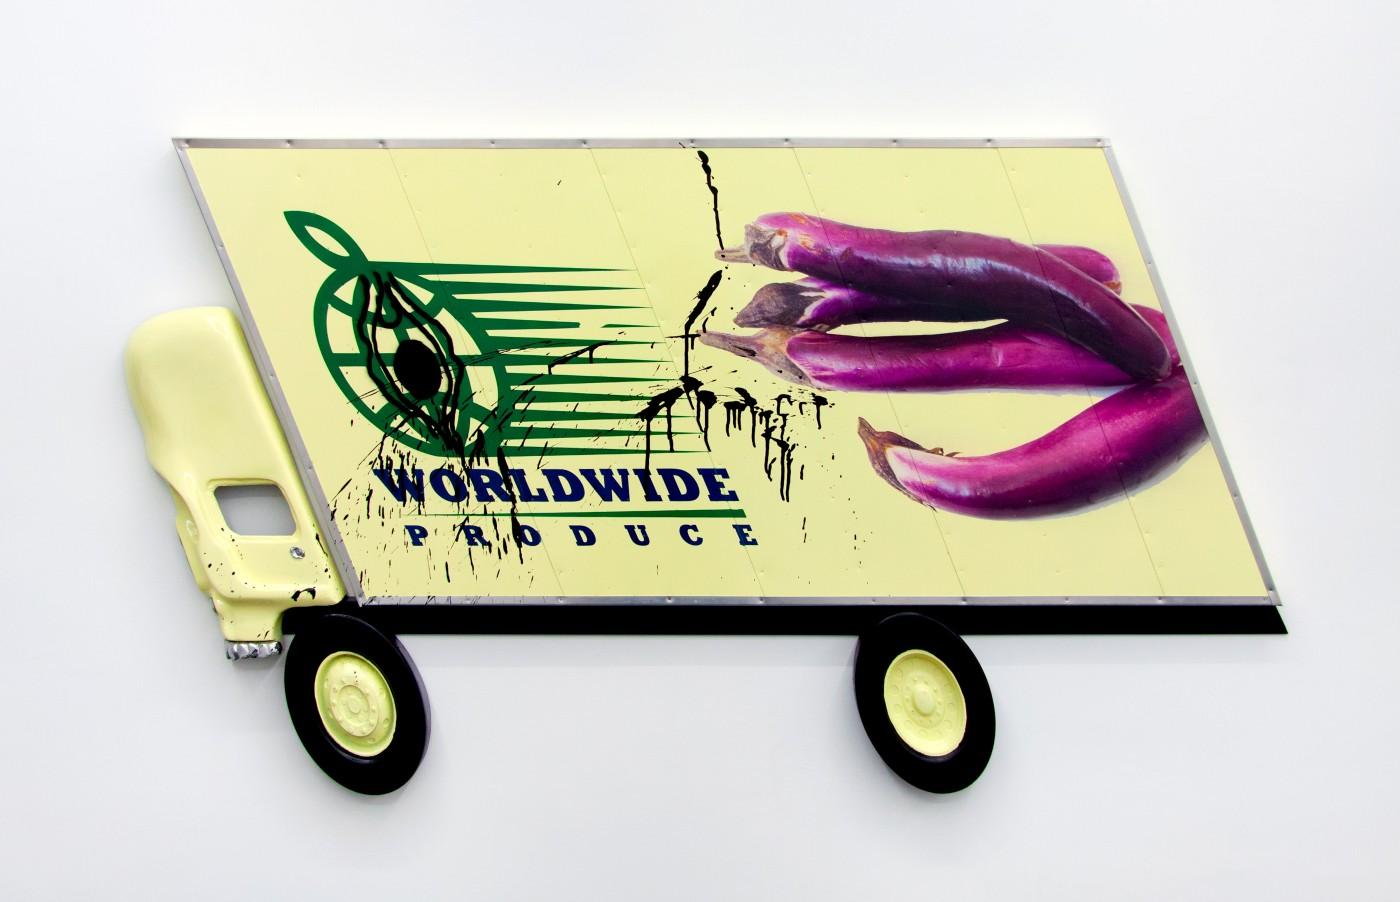 Wind Parade  Box Truck Painting (Japanese  Eggplant) , 2014   Inkjet, enamel, spray paint, urethane, pewter, aluminum, wood   80 x 160 x 3 cm / 31.4 x 63.9 x 1.2 in   Pentti Monkkonen